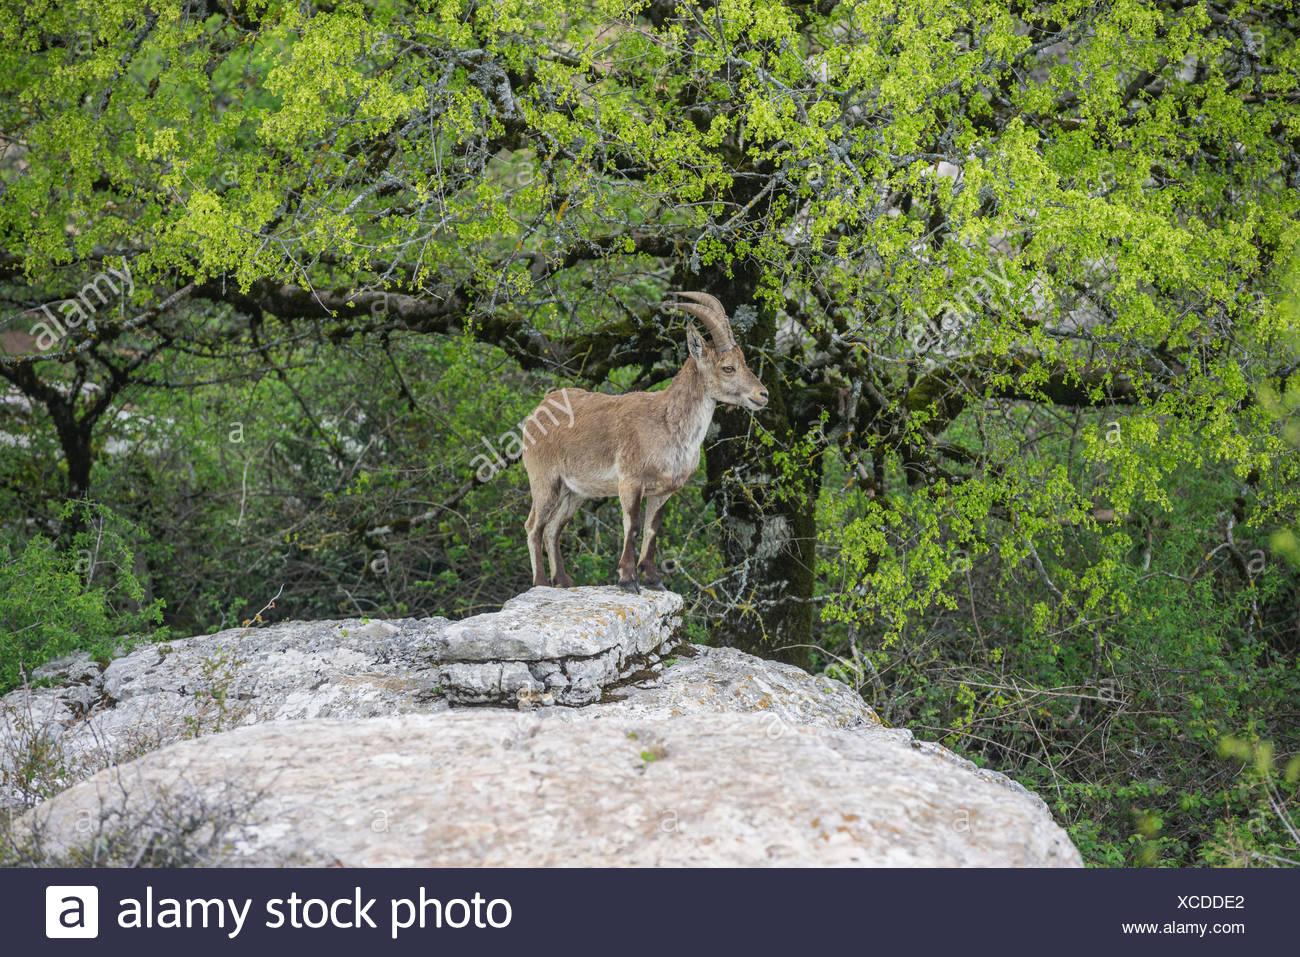 Spanish Ibex (Capra pyrenaica hispanica), Antequera, Andalusia, Spain - Stock Image